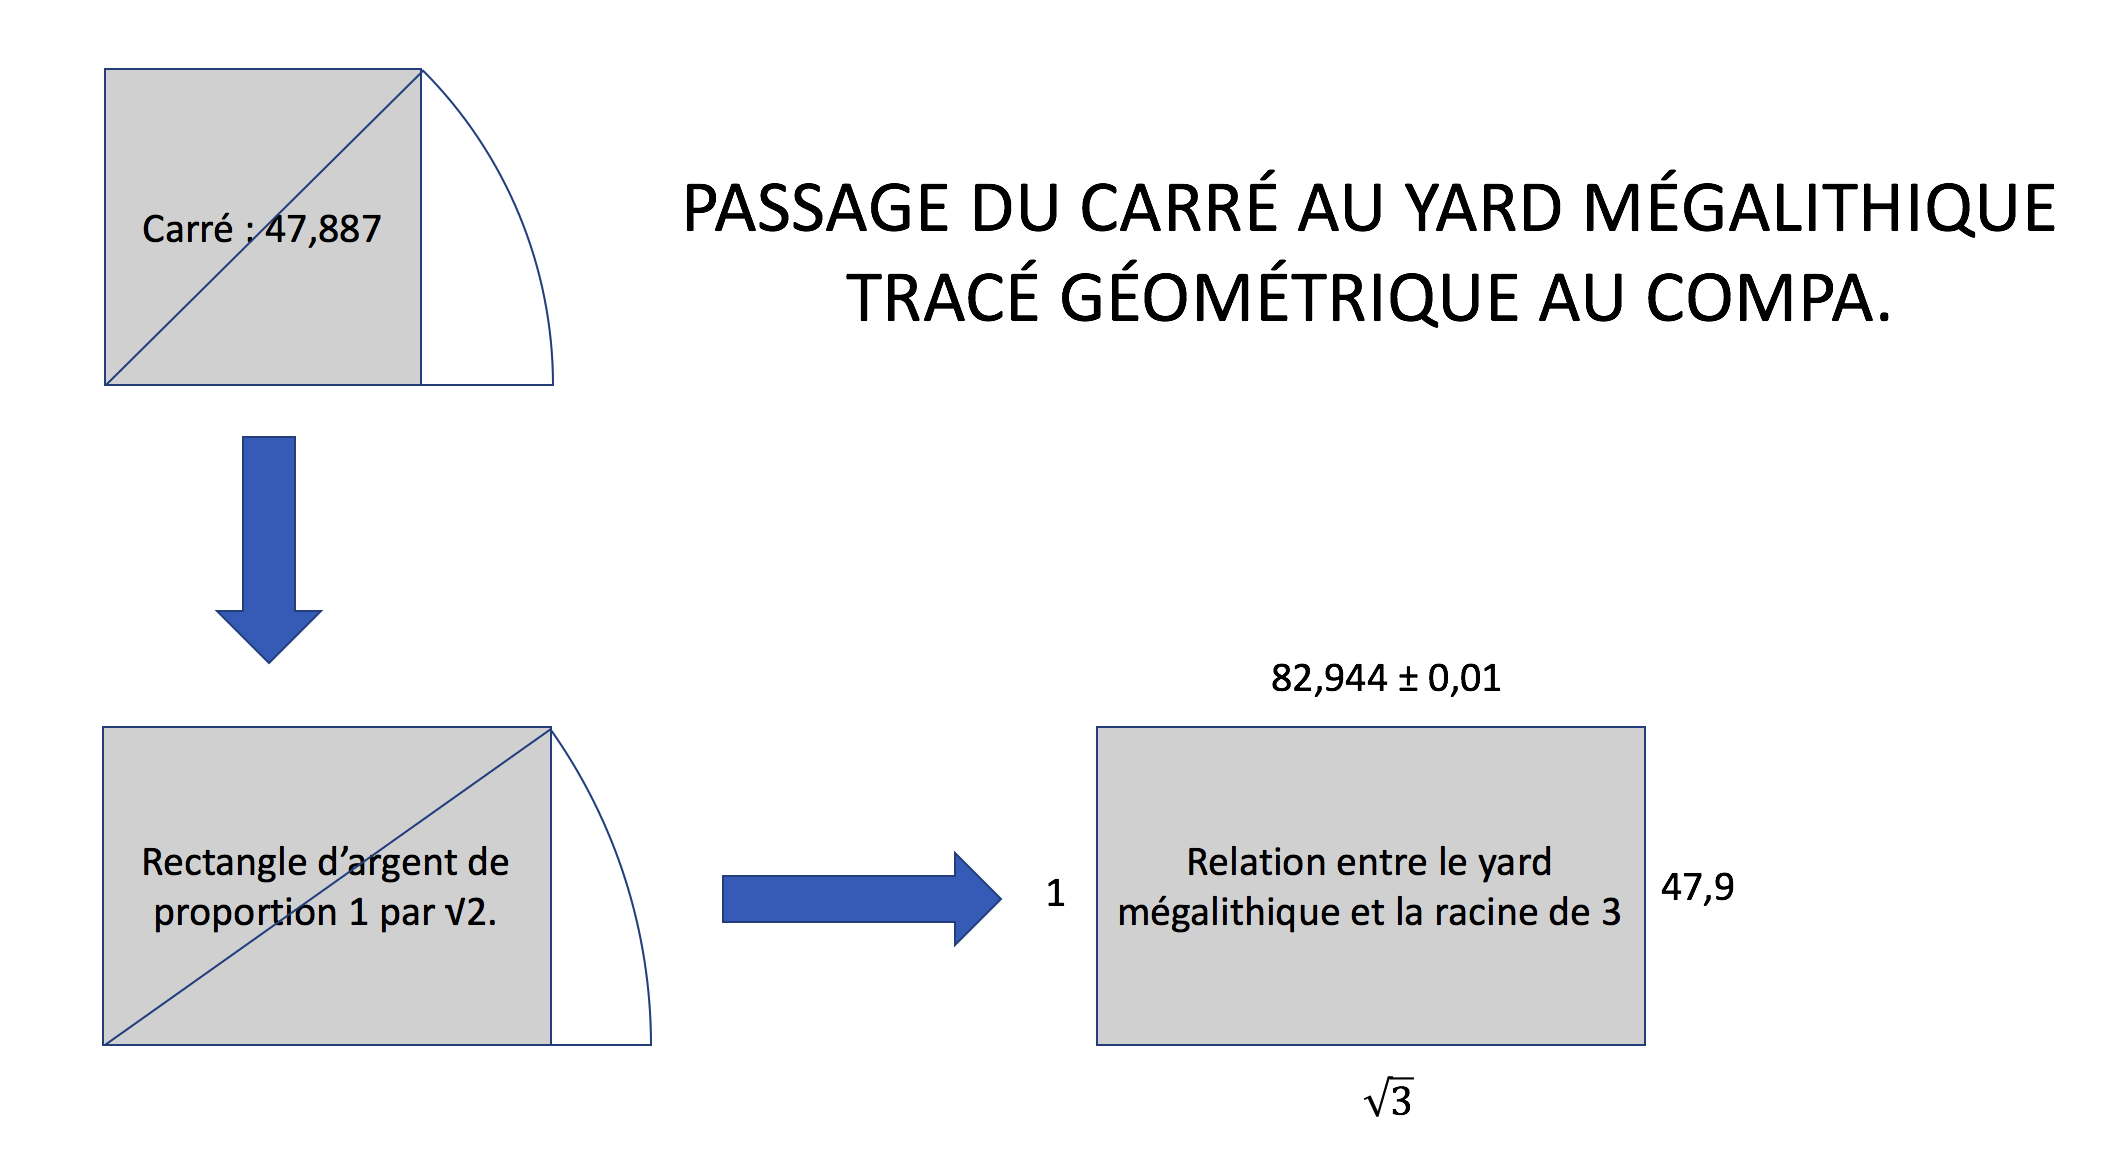 2018-03-02 11:15:46